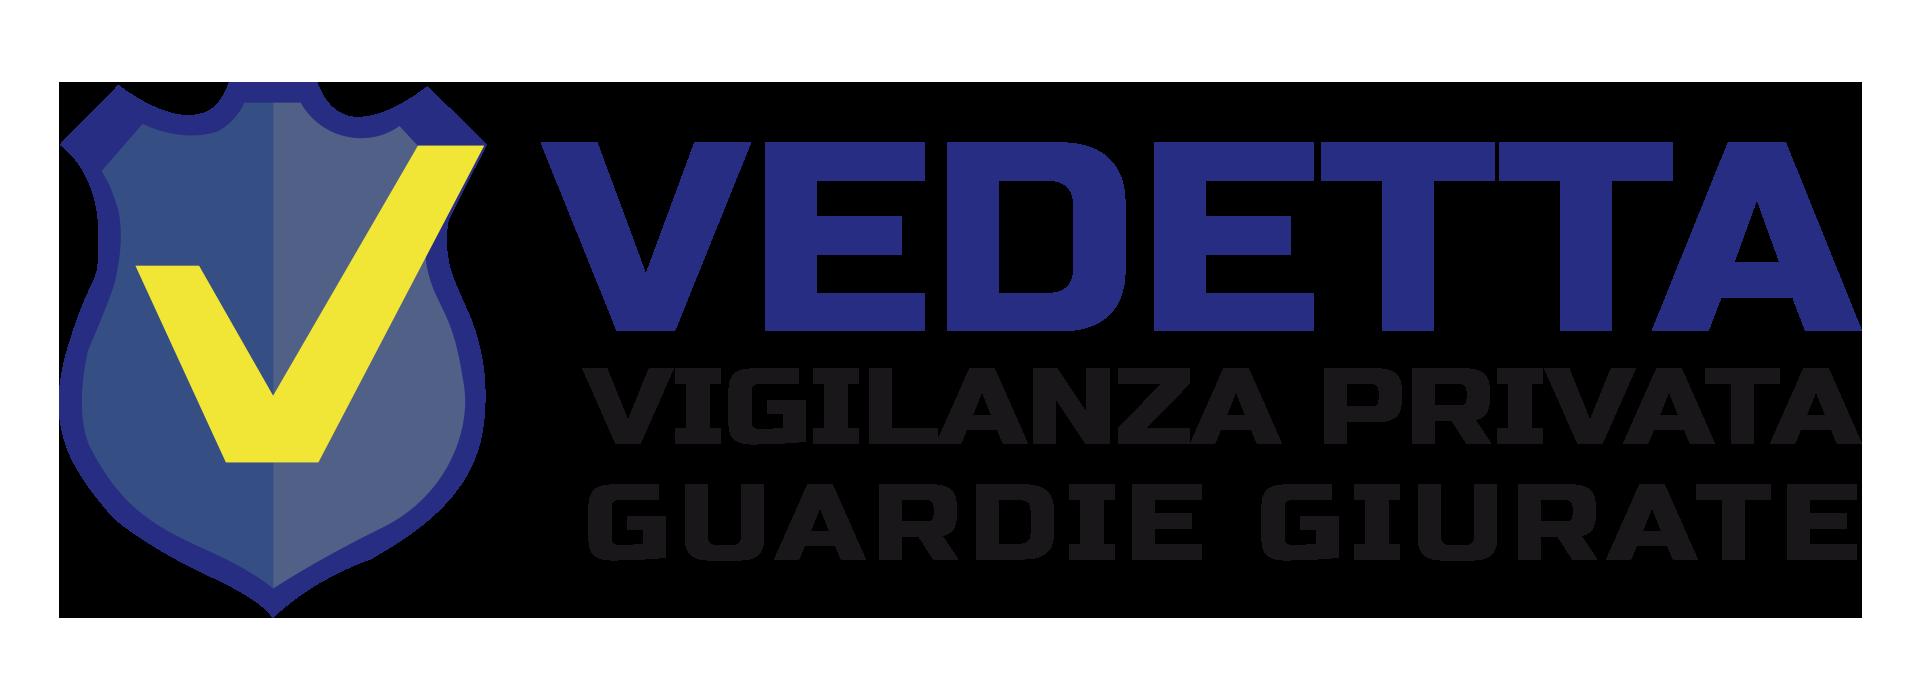 logovedetta_ASTI Vedetta Asti, Vedetta Alba, Vedetta Nord Italia